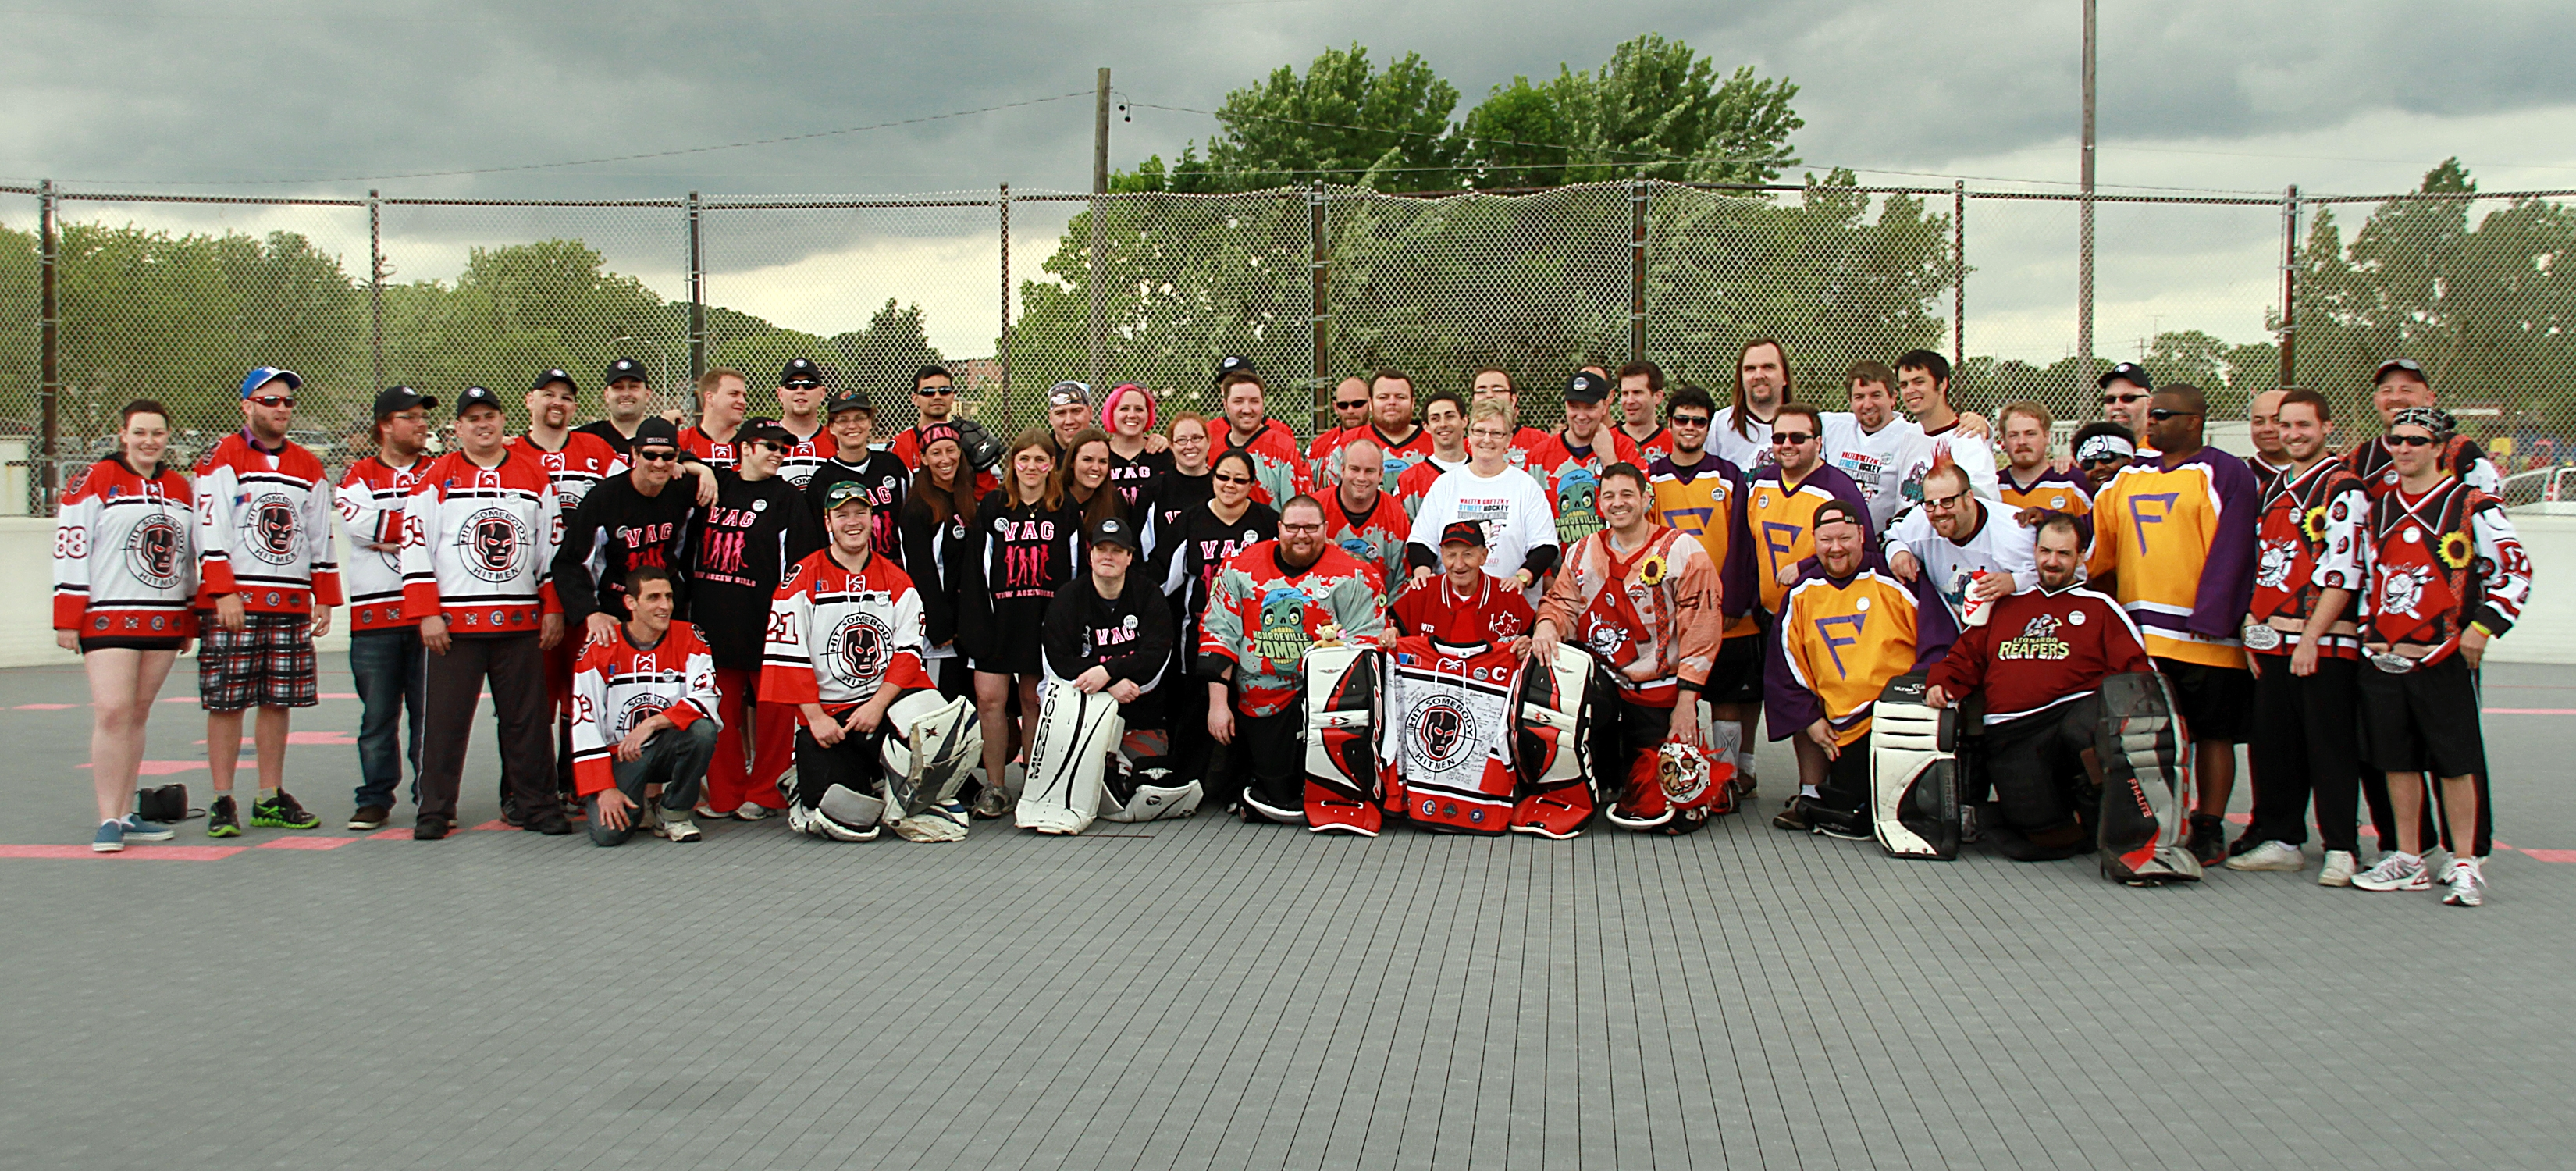 Walter Gretzky Street Hockey View Askew - Ontario Lung Association